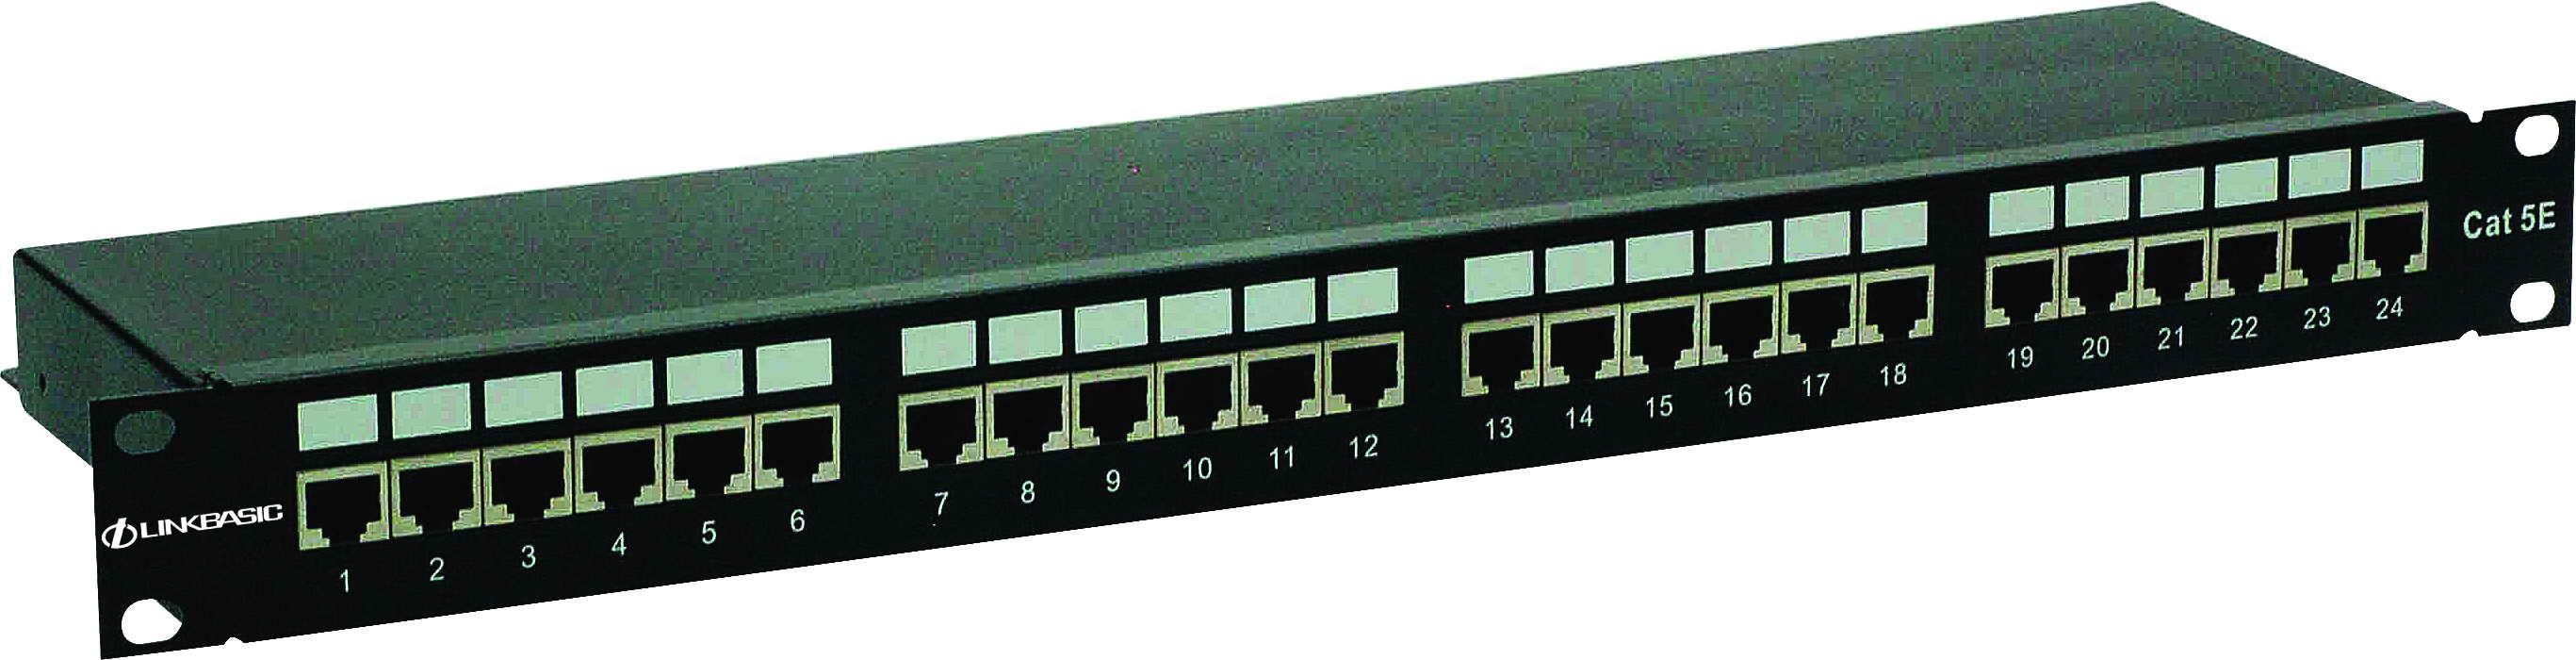 Cisco 24 port patch panel price